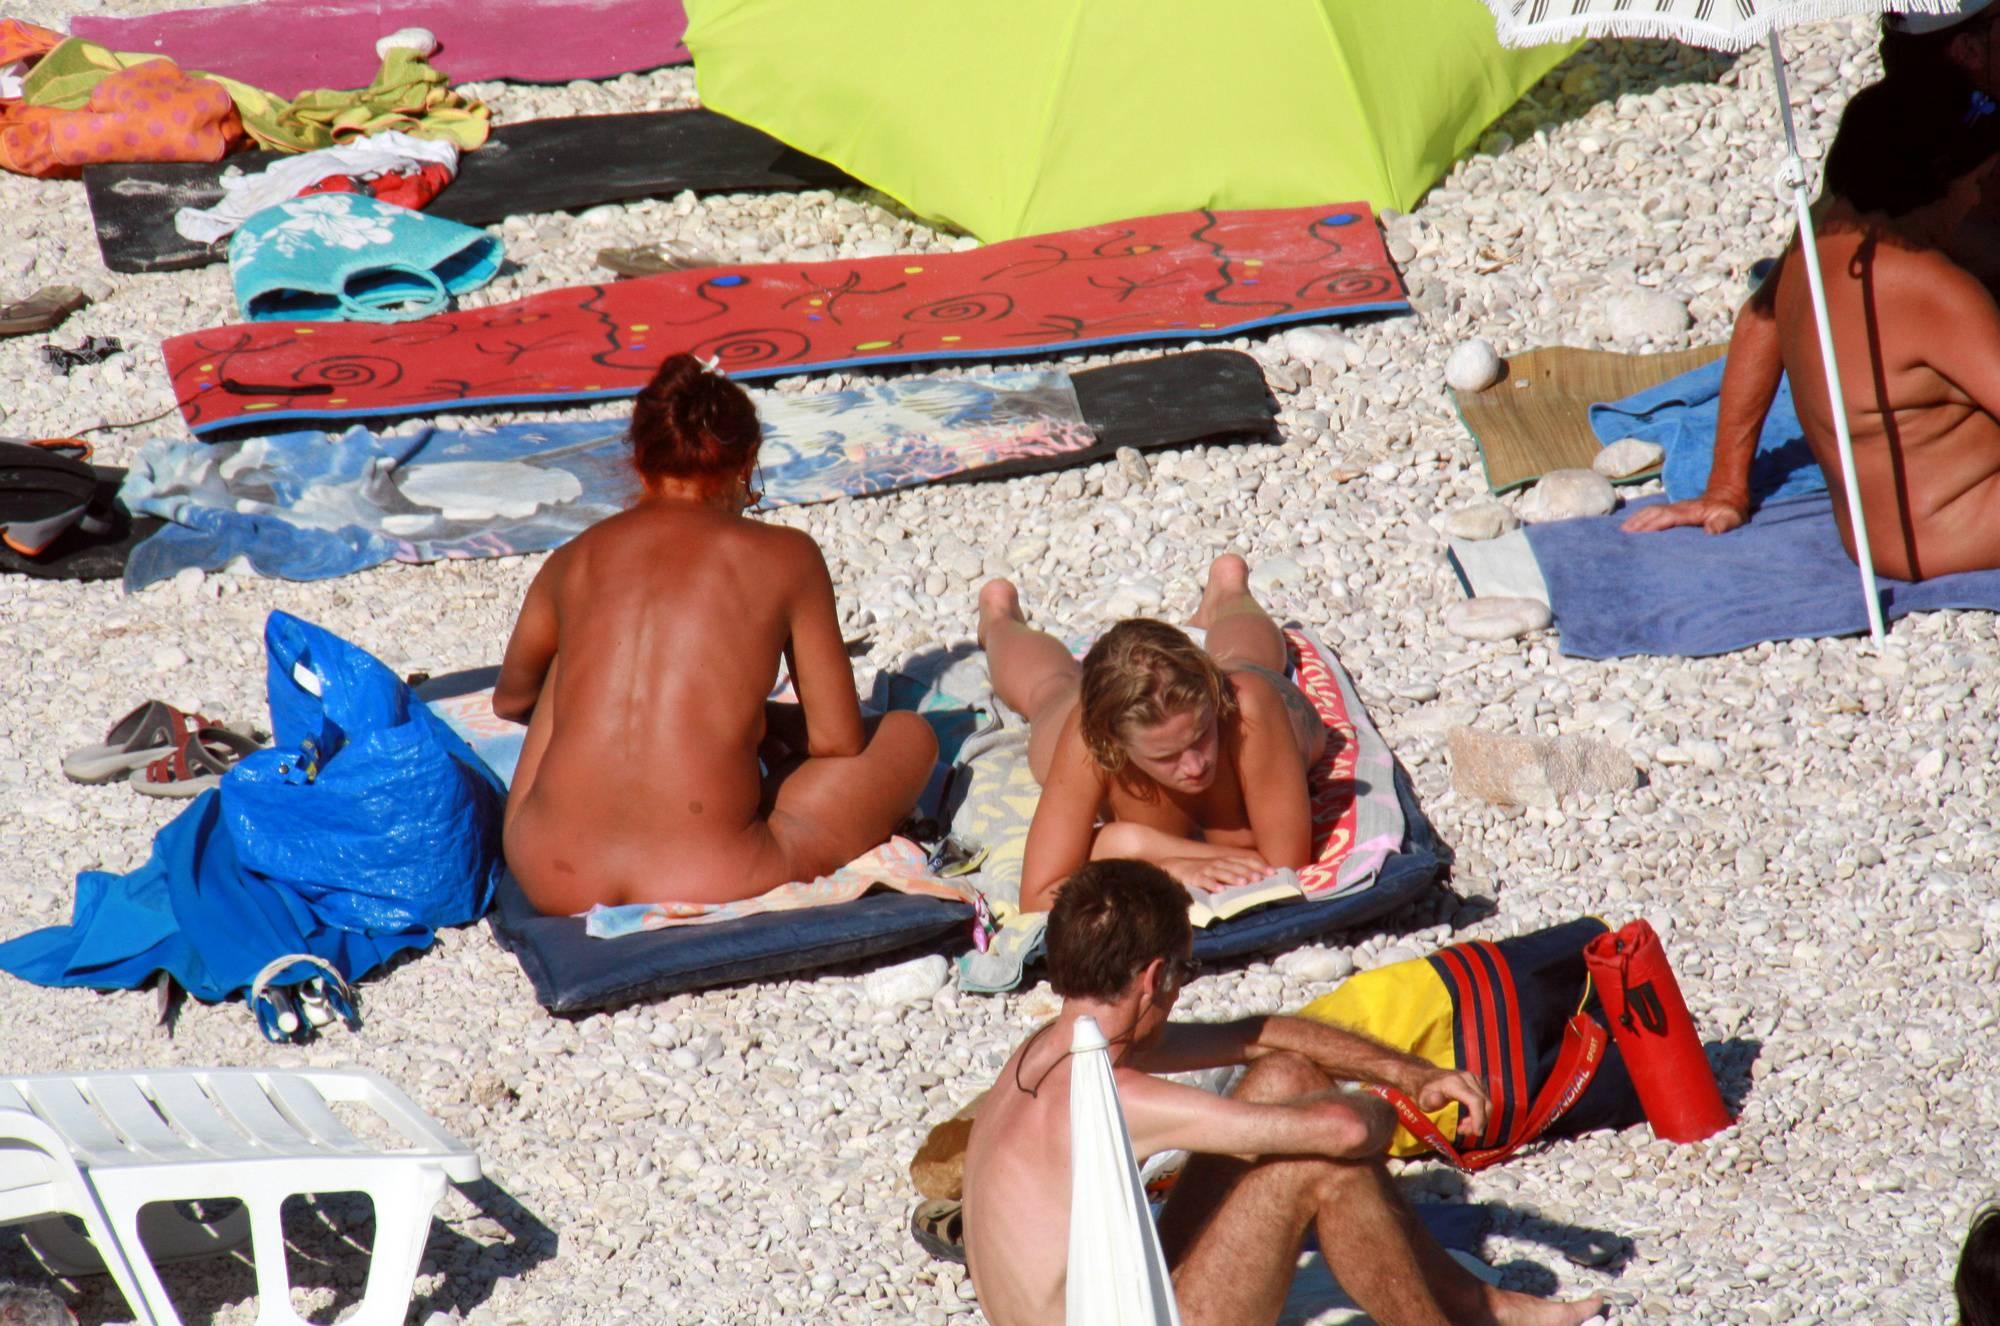 Nudist Beach Assortment - 1